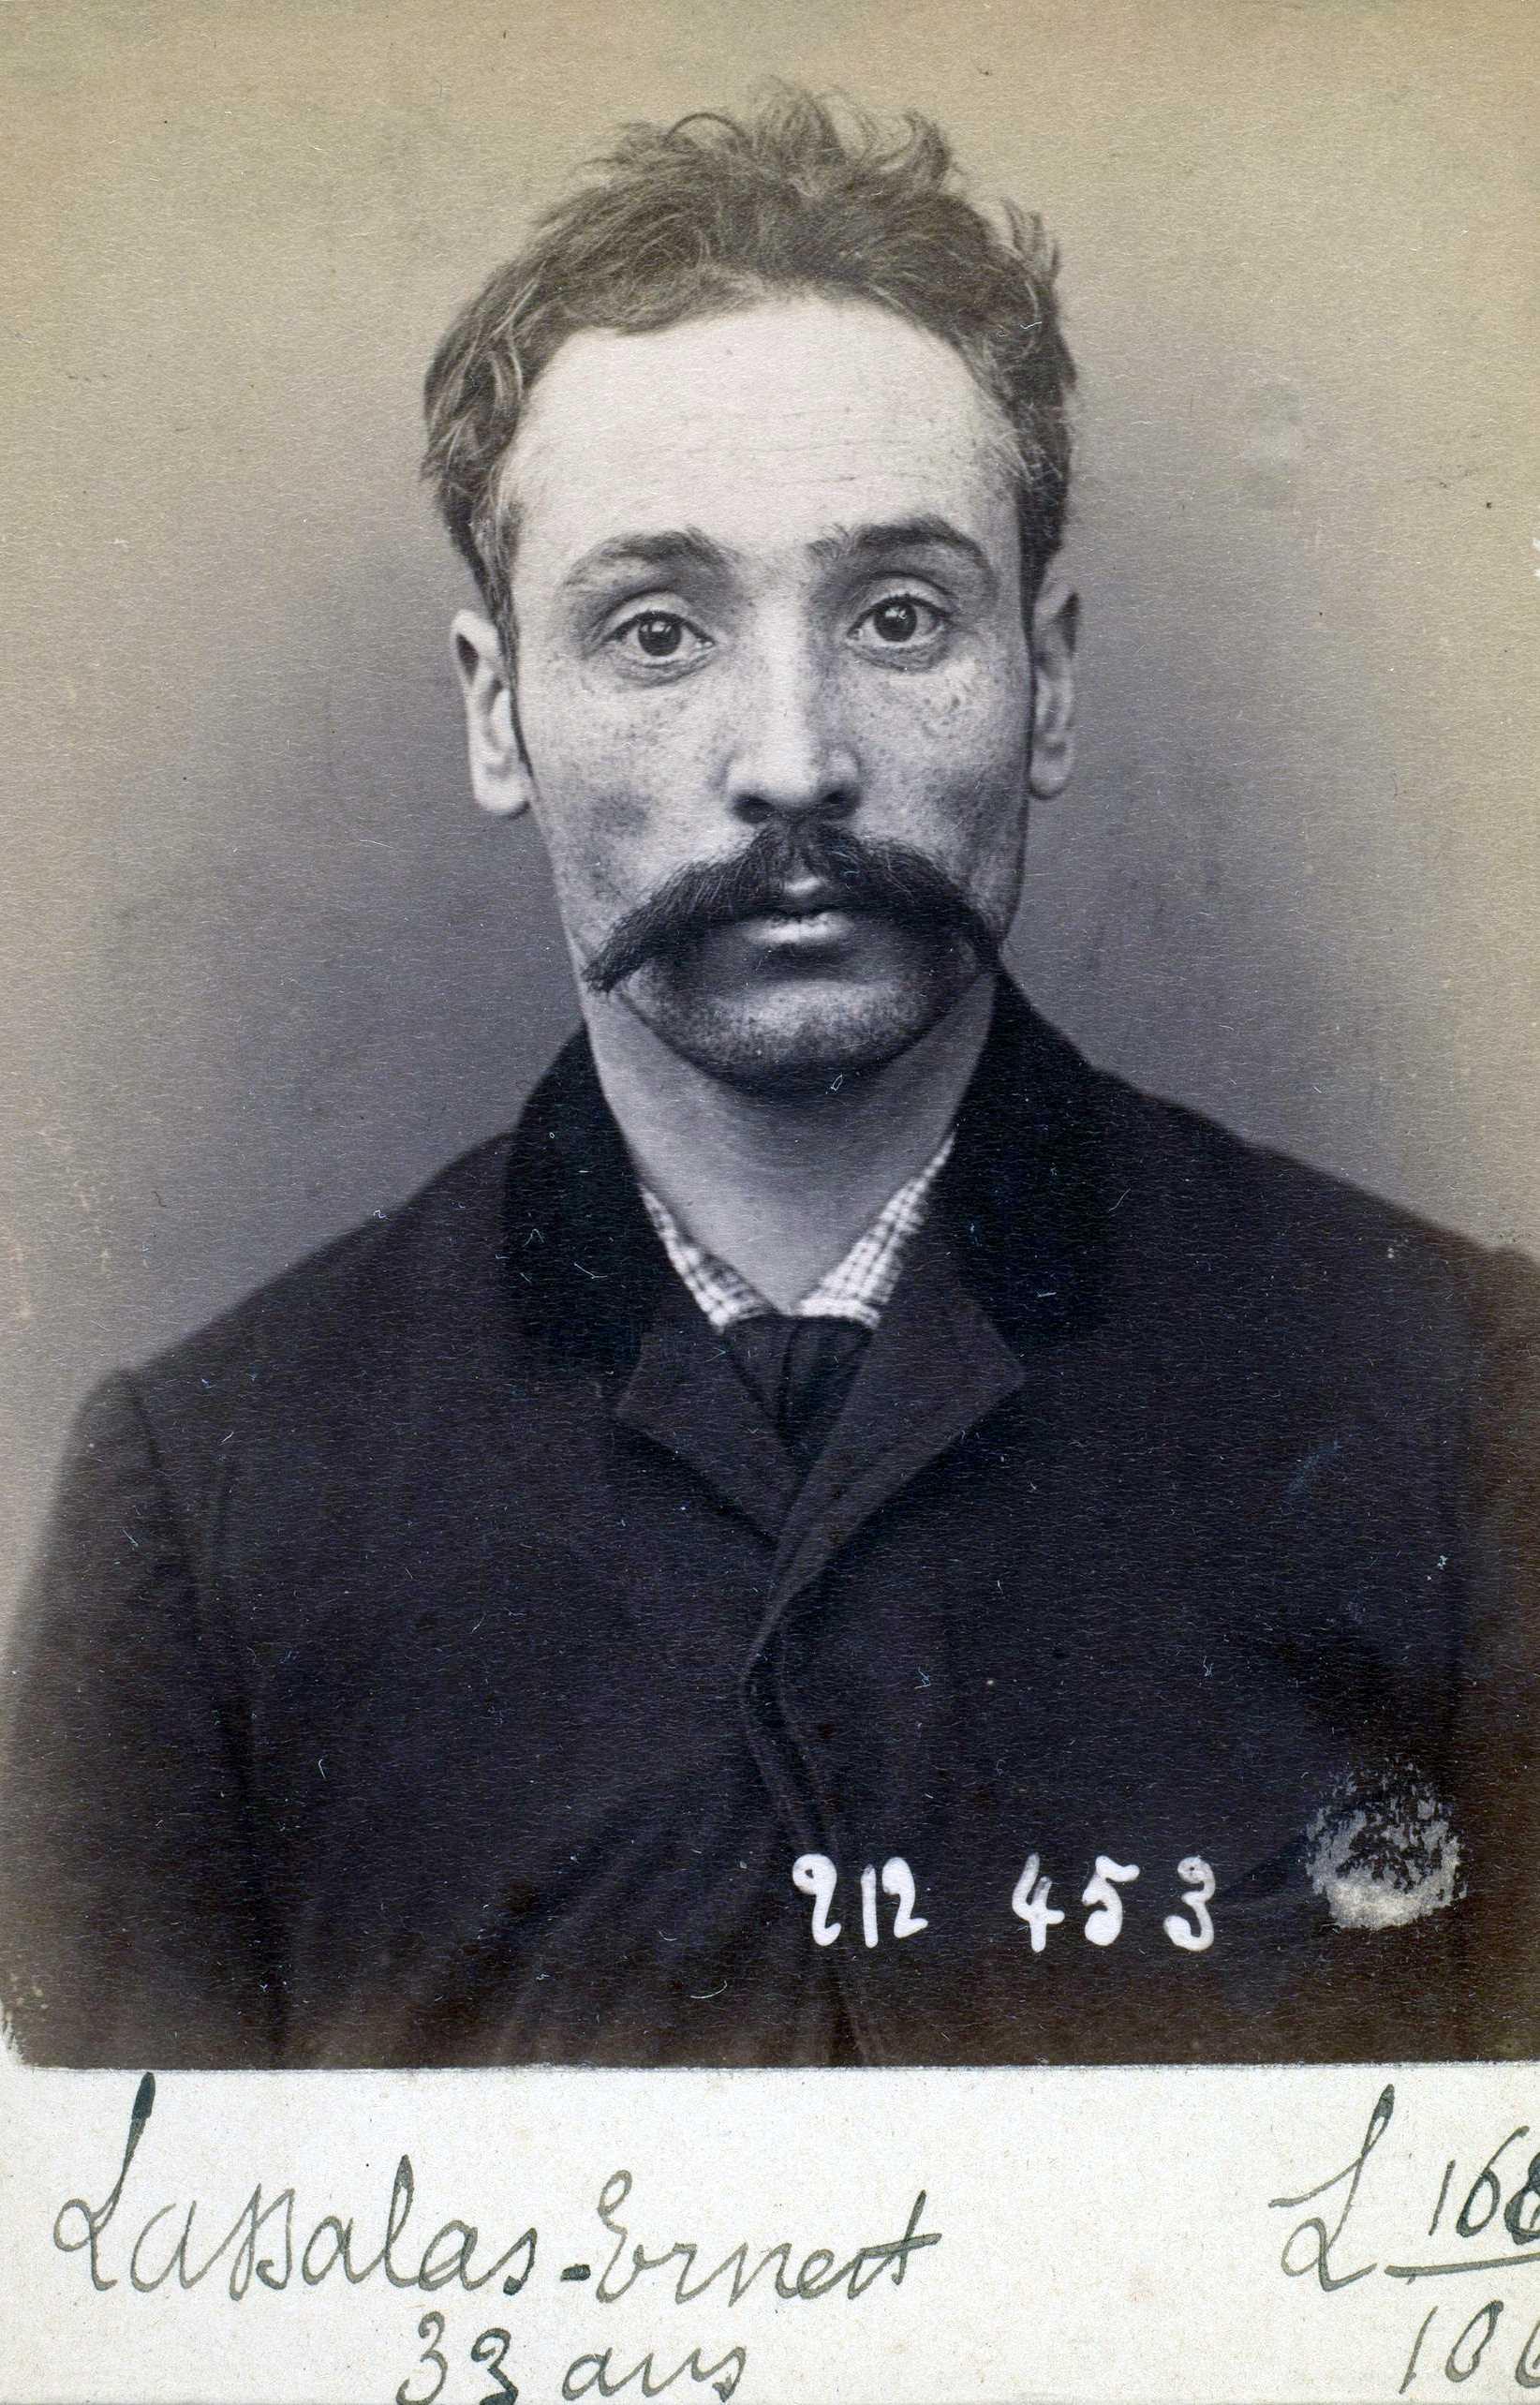 Foto policíaca d'Ernest Lassalas (2 de gener de 1894)